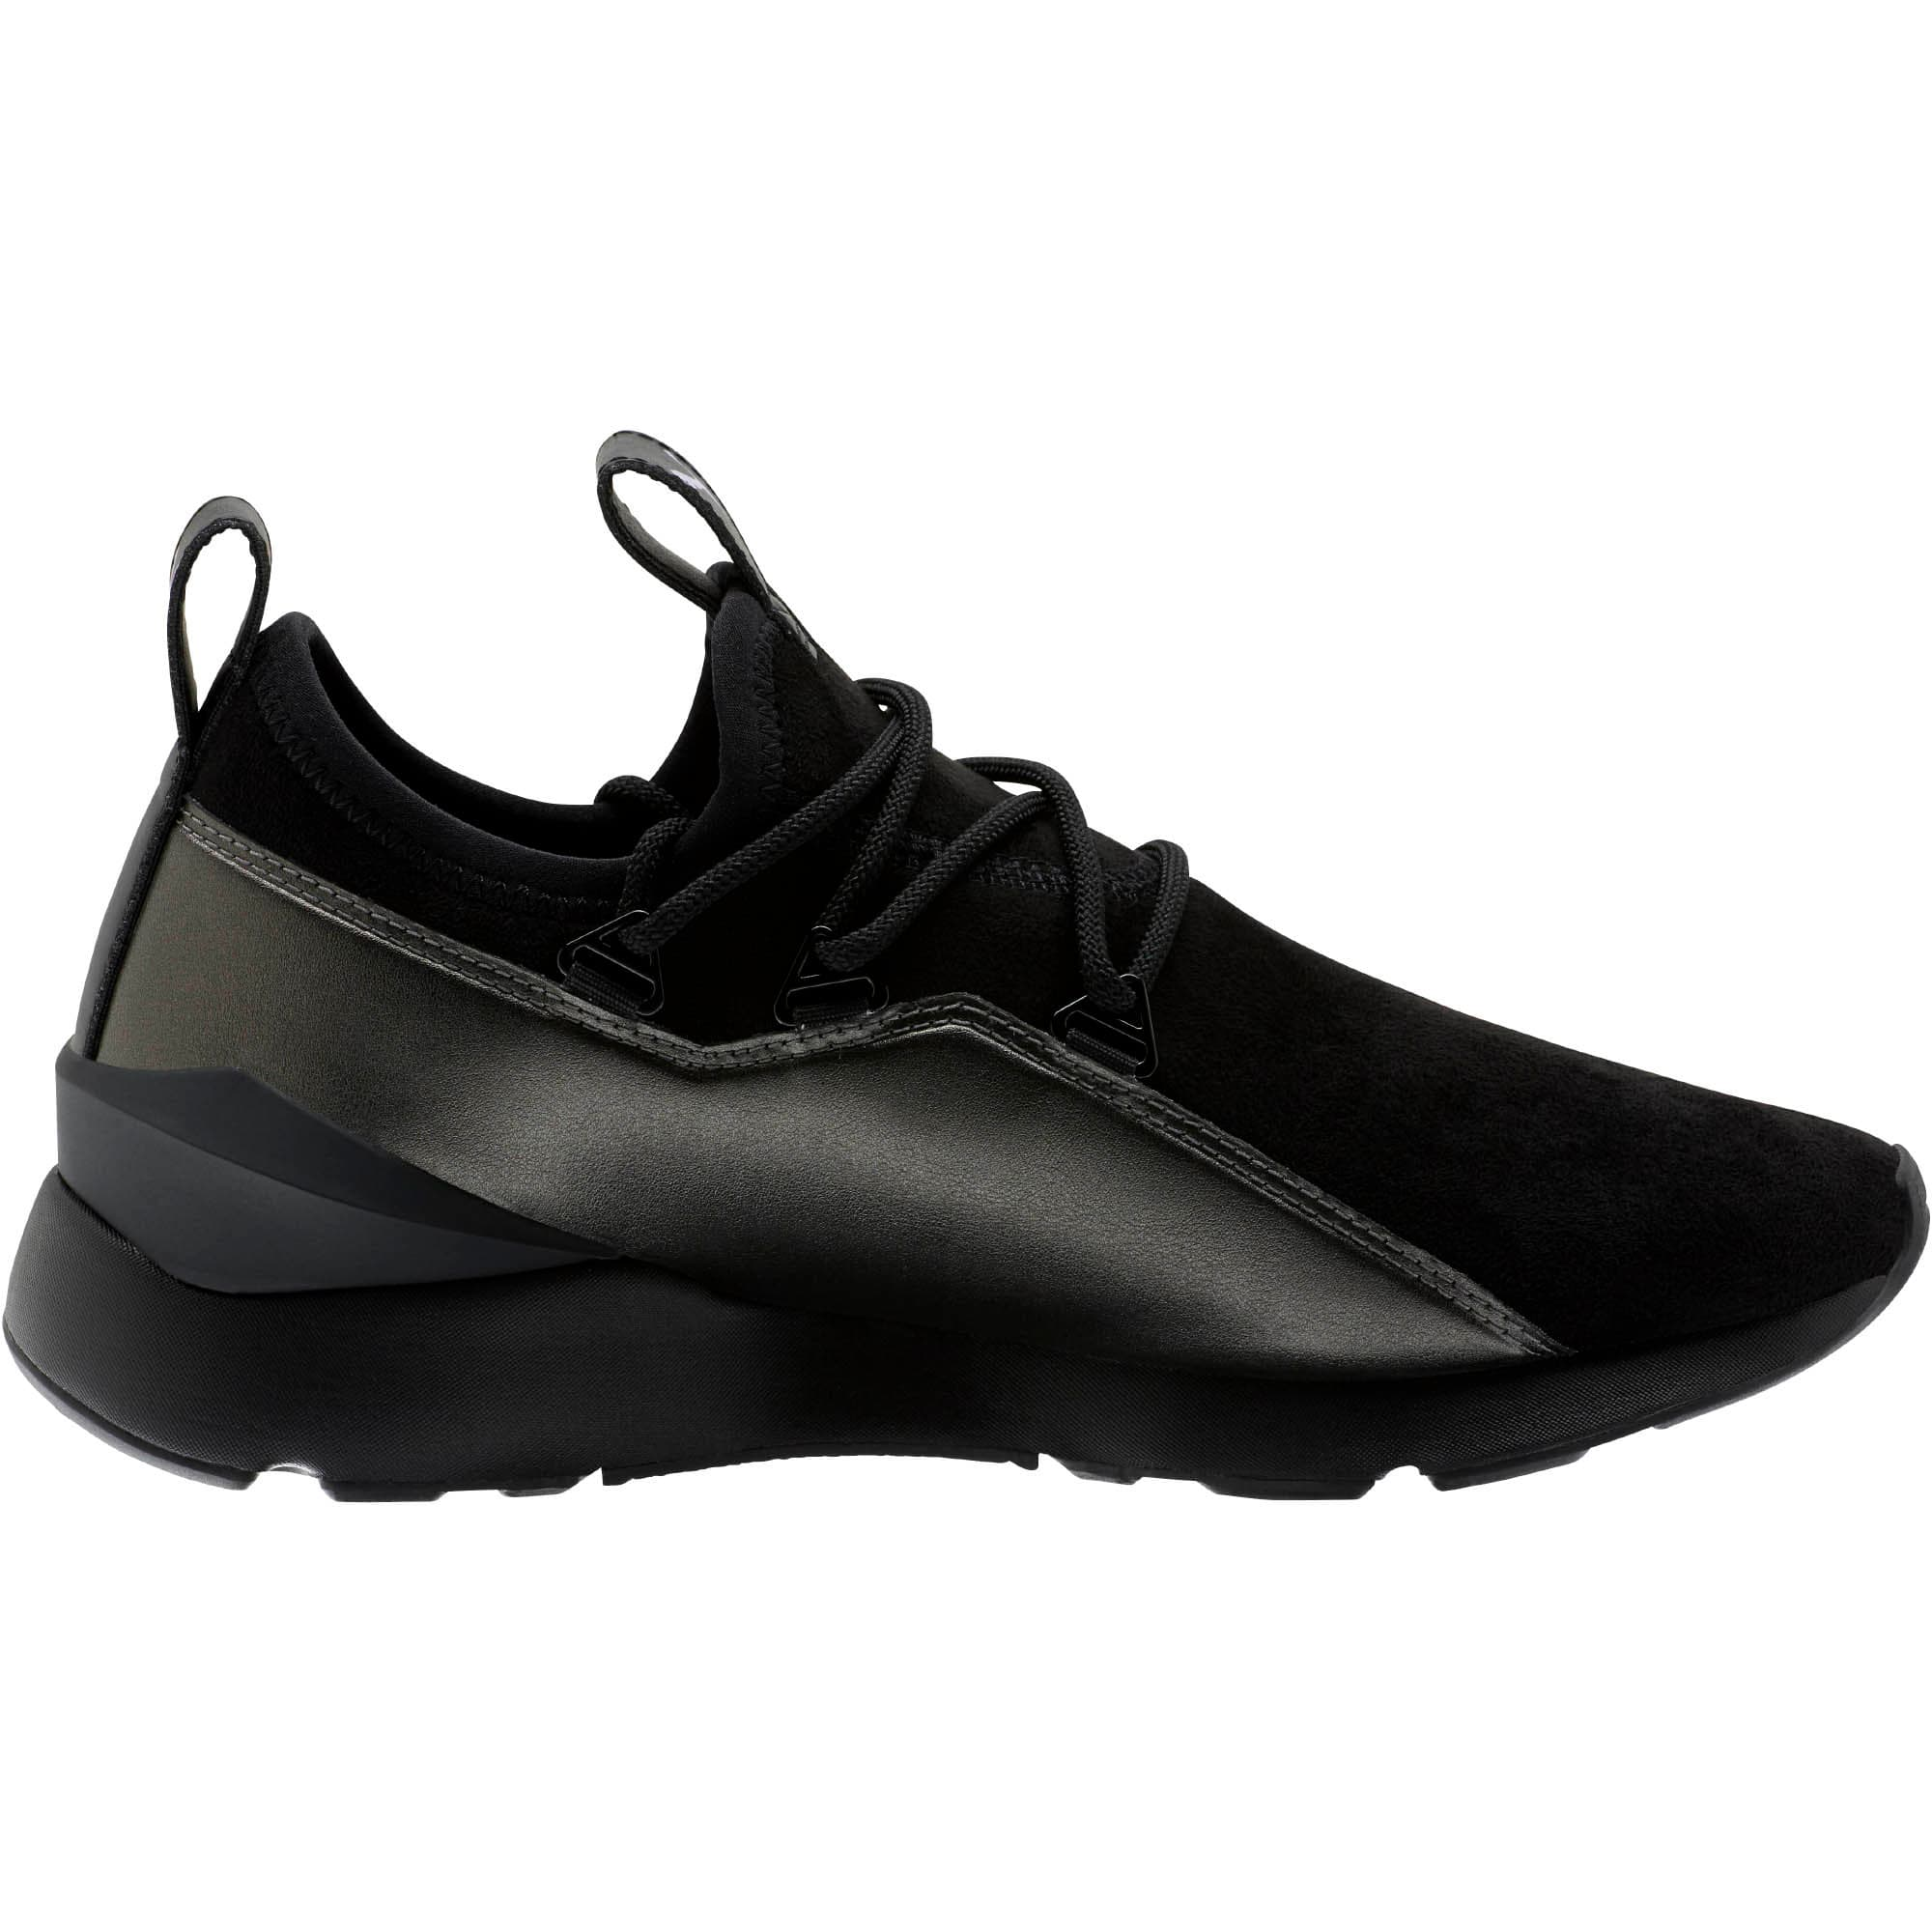 Miniatura 4 de Zapatos deportivosMuse 2 Twilight de mujer, Puma Black-Puma Black, mediano